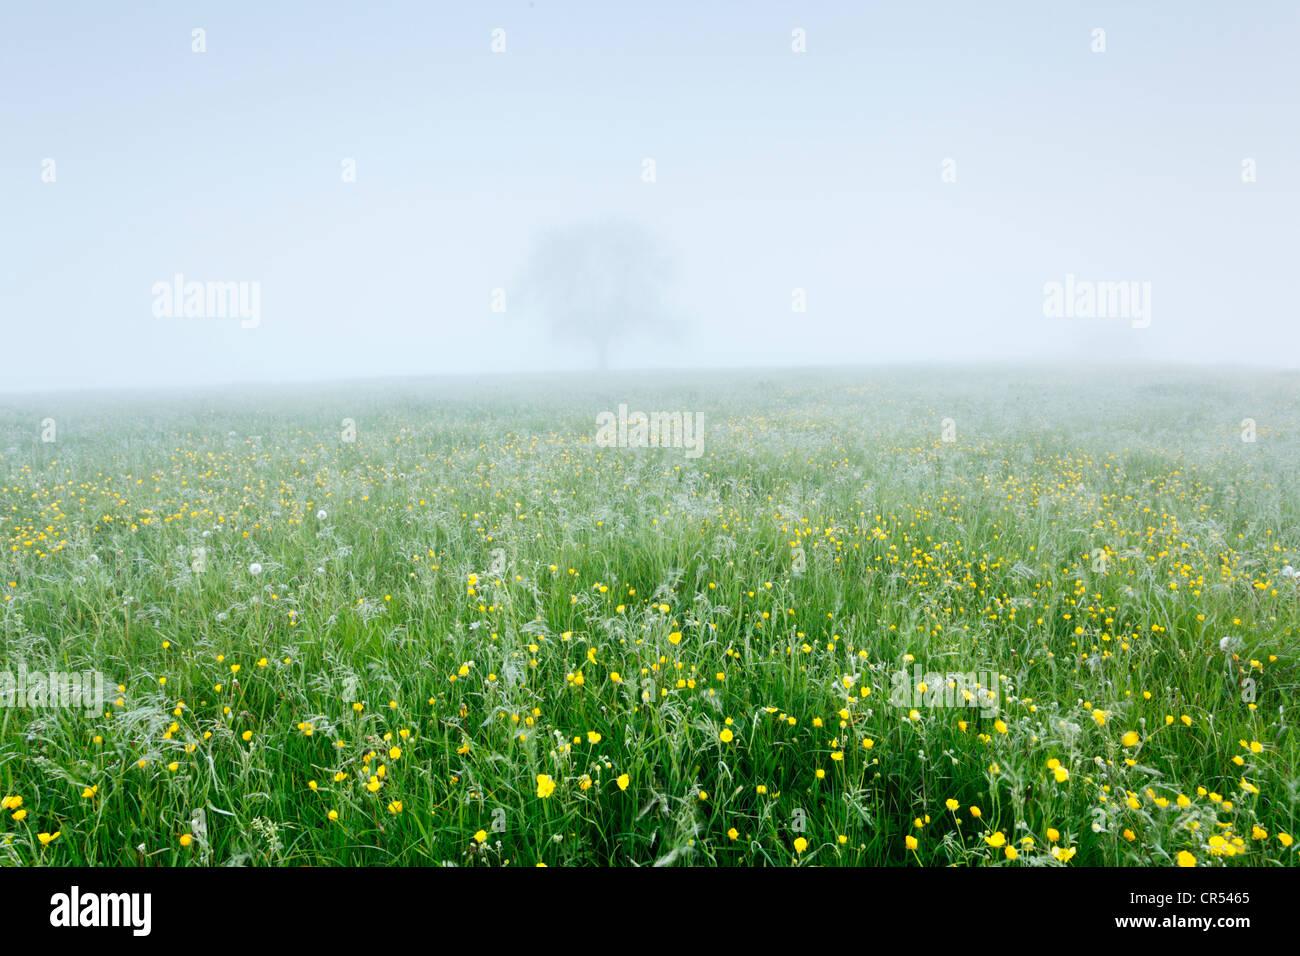 Misty Meadow in the Mendip Hills. Somerset. England. UK. - Stock Image